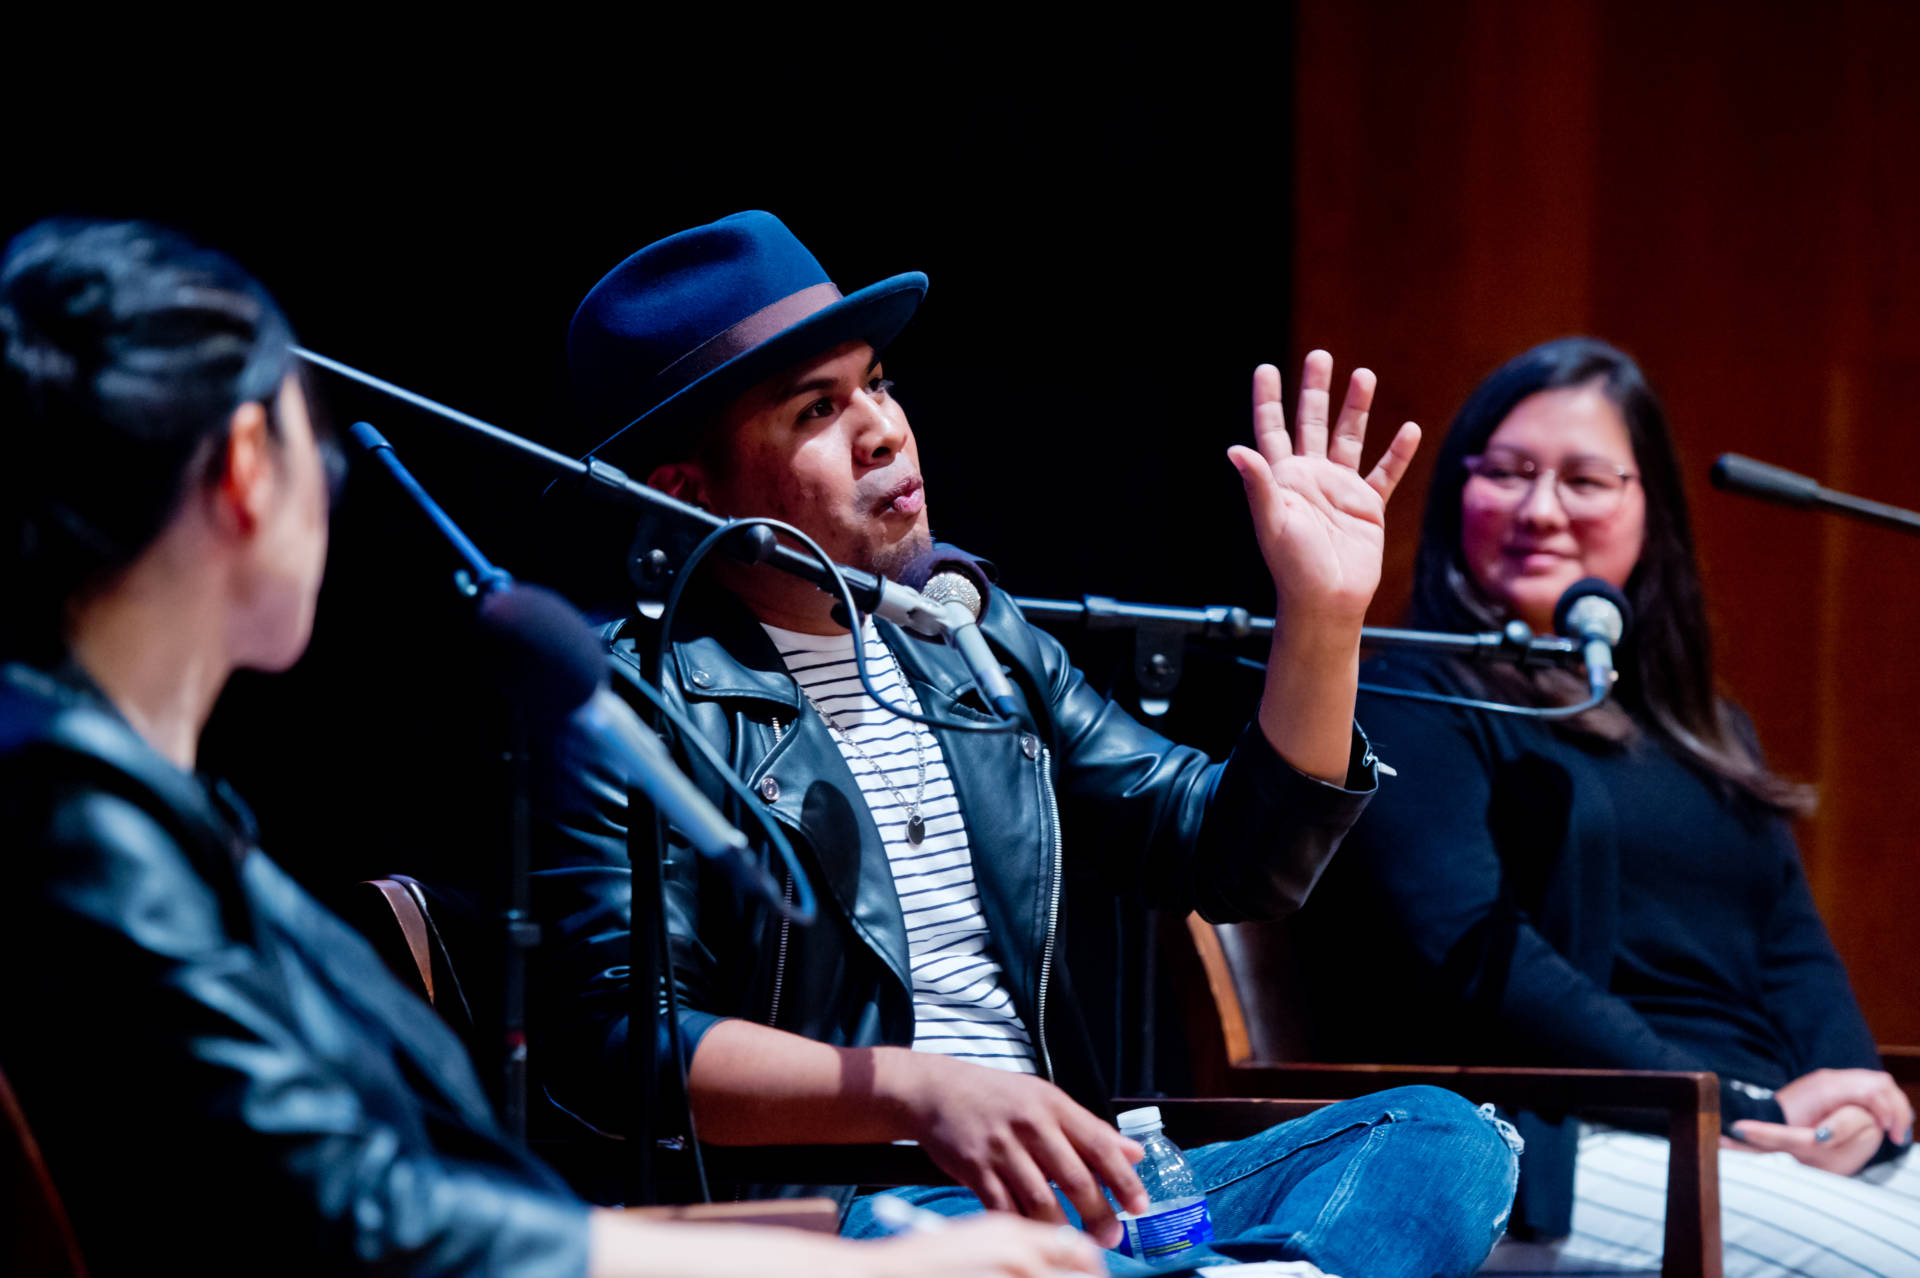 Yosimar Reyes and Gabriela Garcia discuss immigration with KQED's Mina Kim on May 9, 2018. Alain McLaughlin/Alain McLaughlin Photography Inc